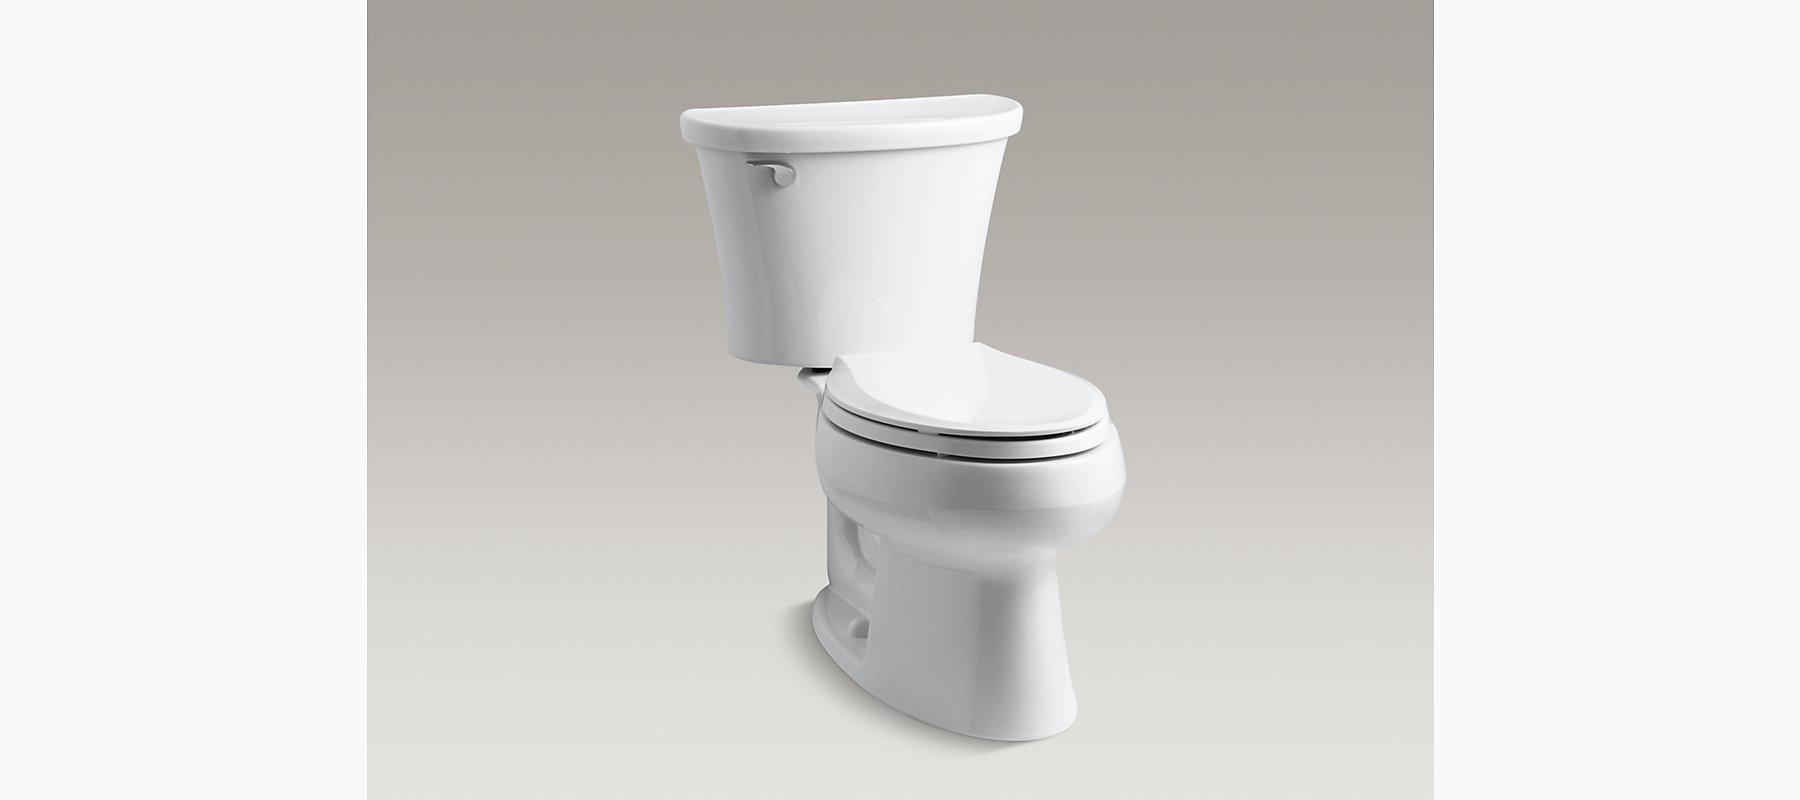 KOHLER|K-12698|Cavata Complete Solution Toilet with Left-Hand Lever ...